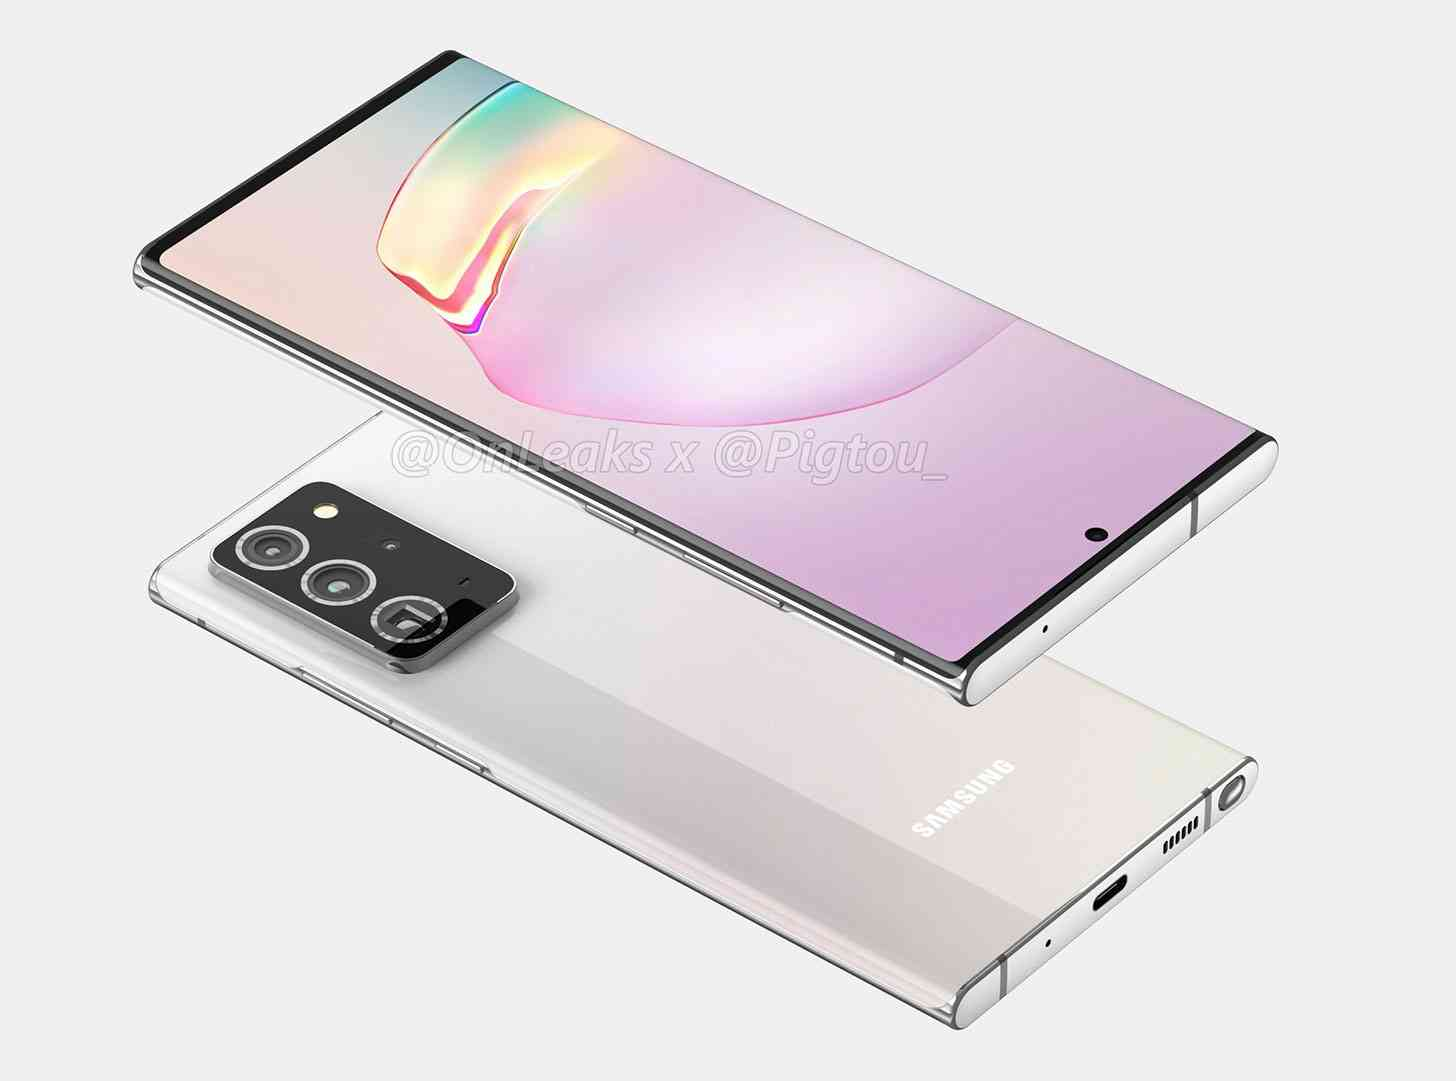 Samsung Galaxy Note 20+ render S Pen location